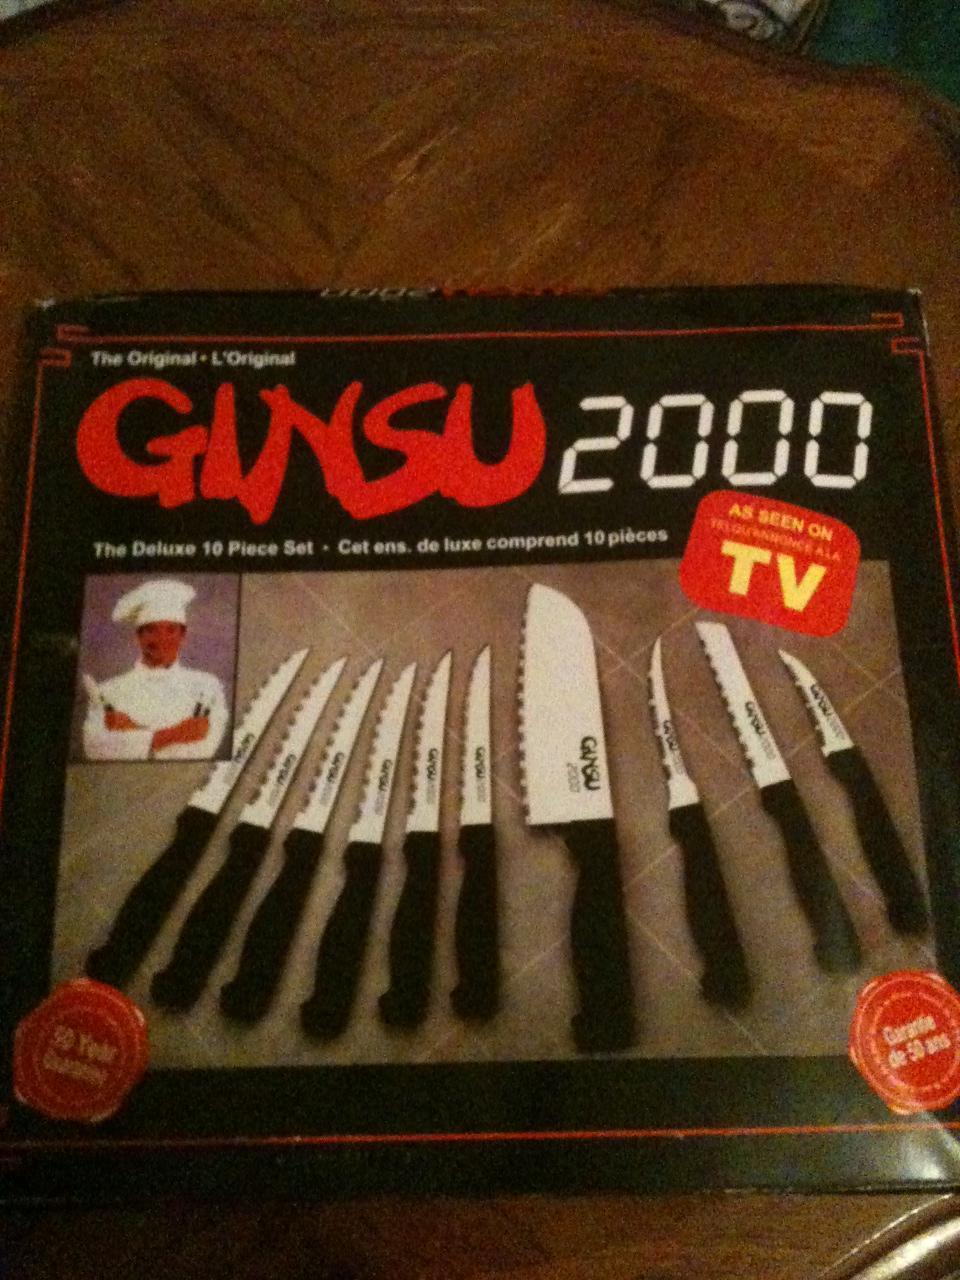 ORIGINAL GINSU 2000 AS SEEN ON TV DELUXE 10 PIECE KNIFE